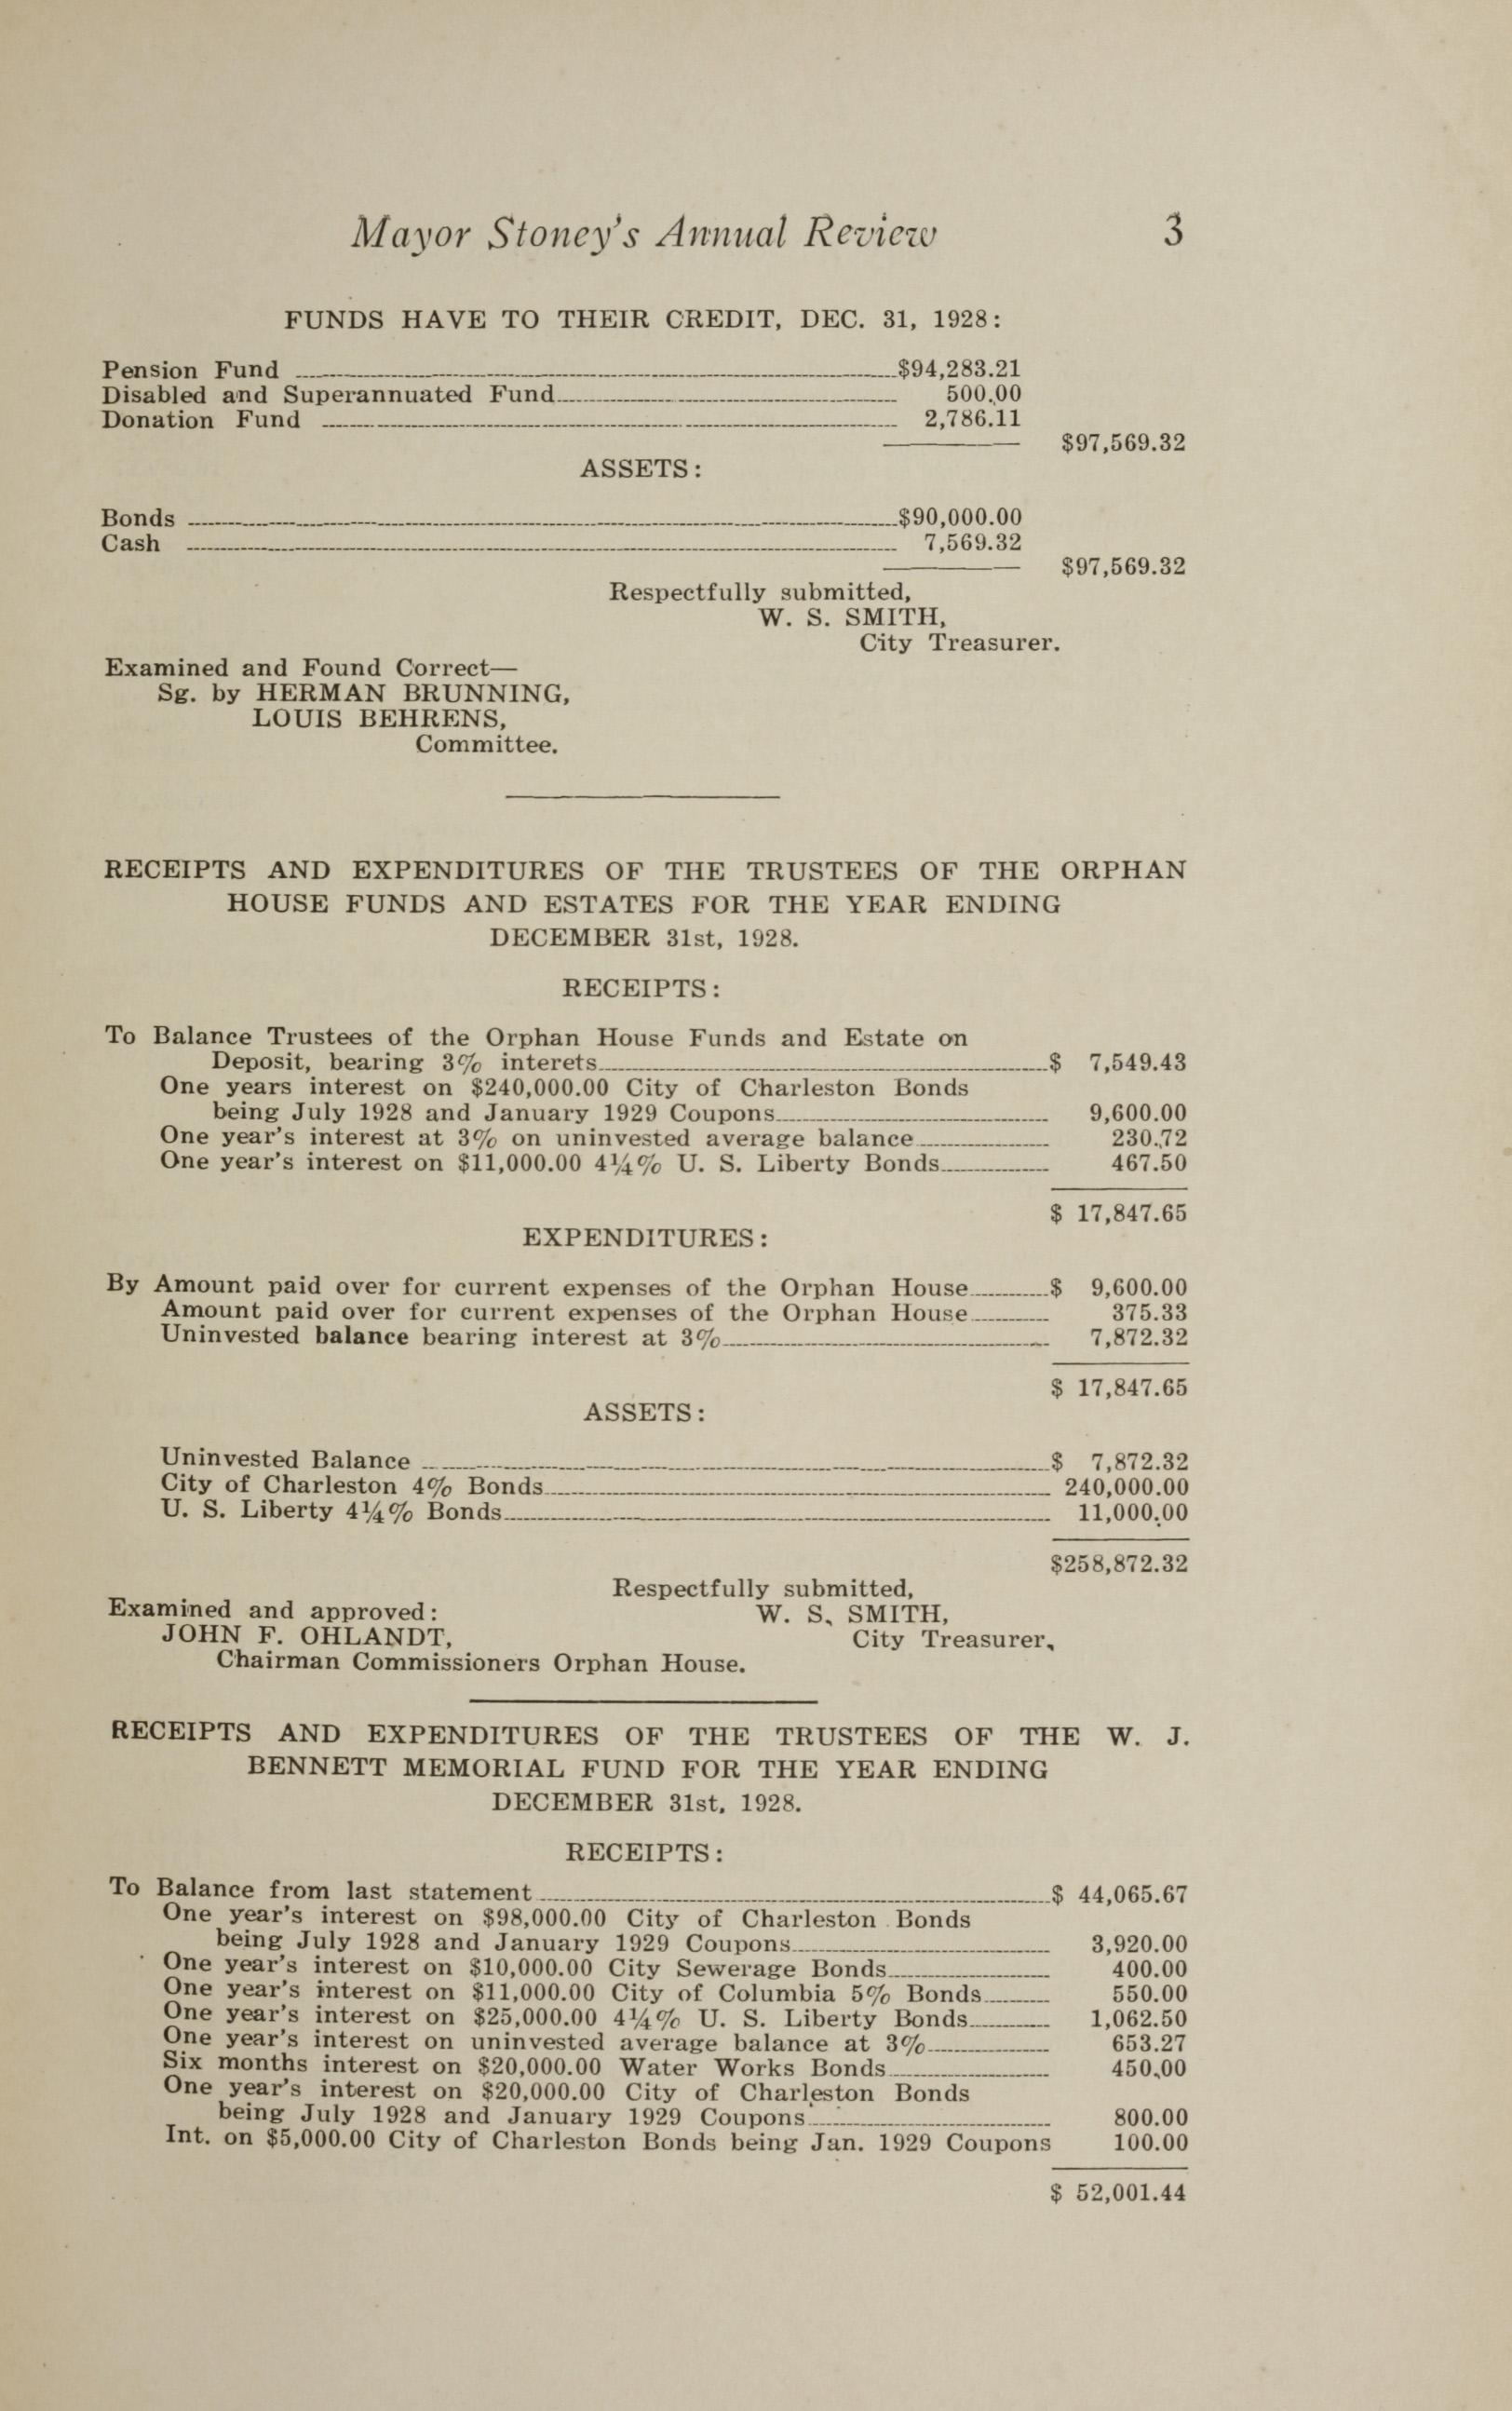 Charleston Yearbook, 1928, page 3